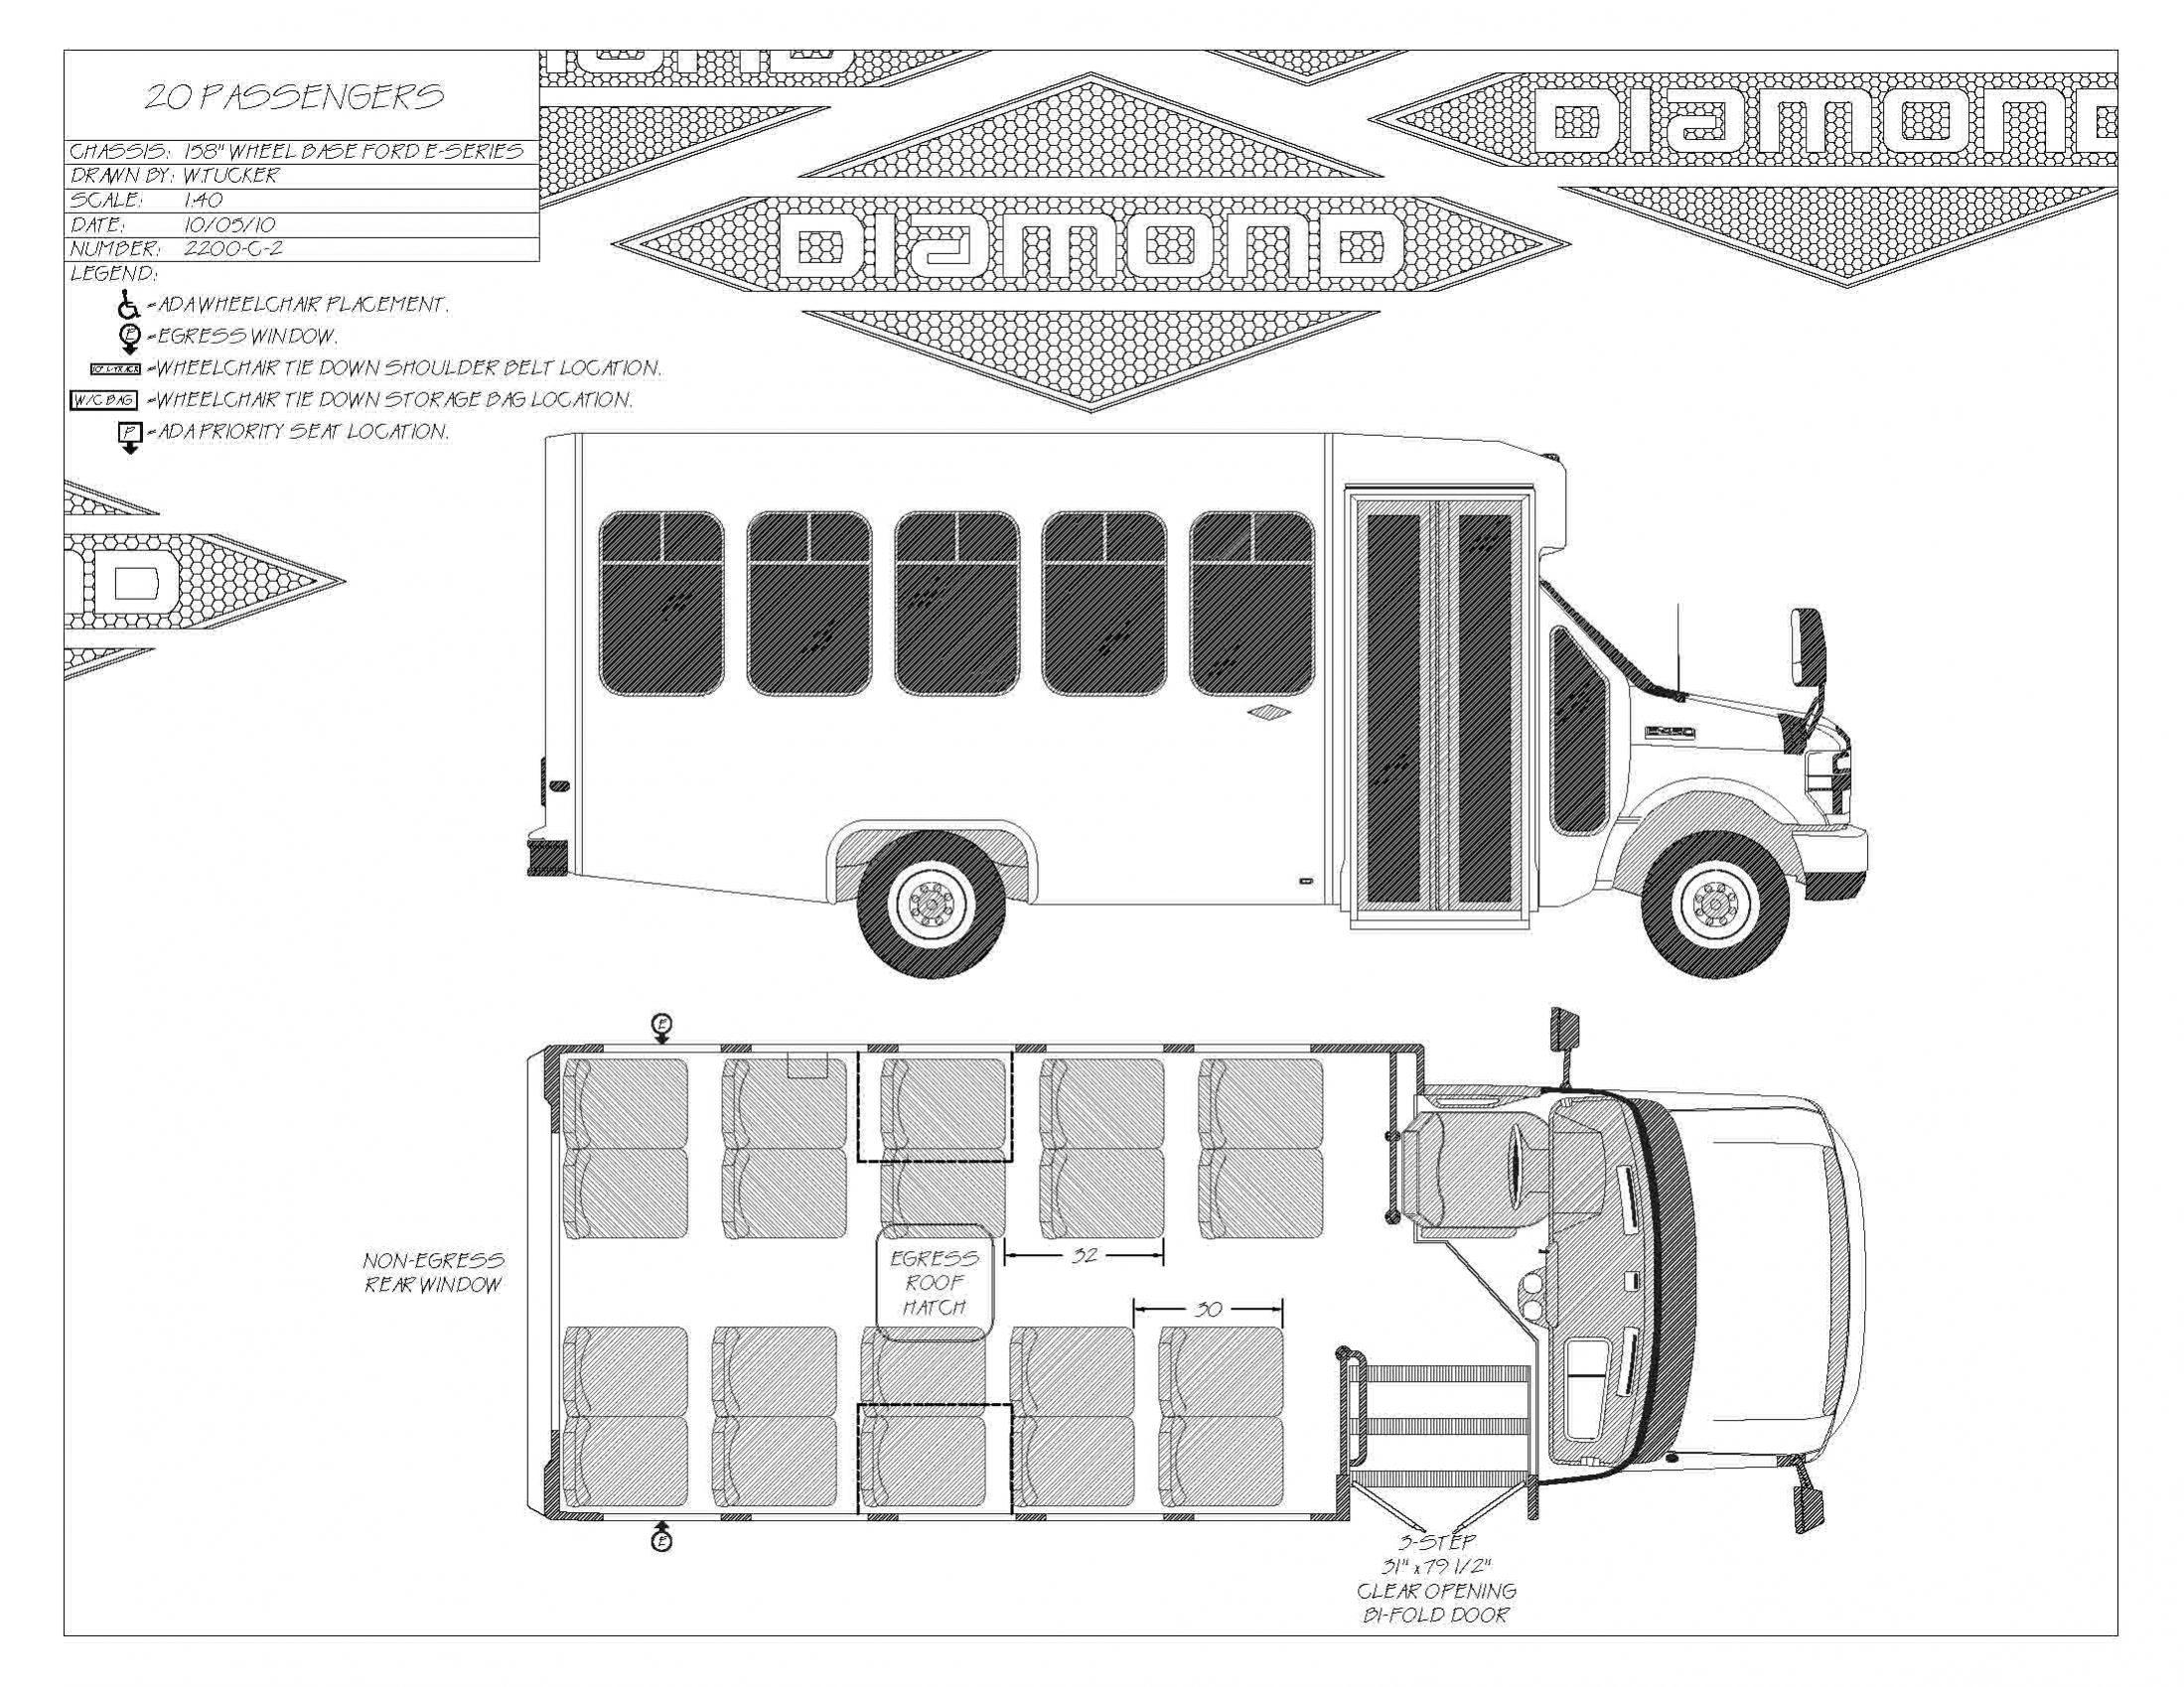 diamond vip 2200 central states bus salesdiamond vip 2200 full